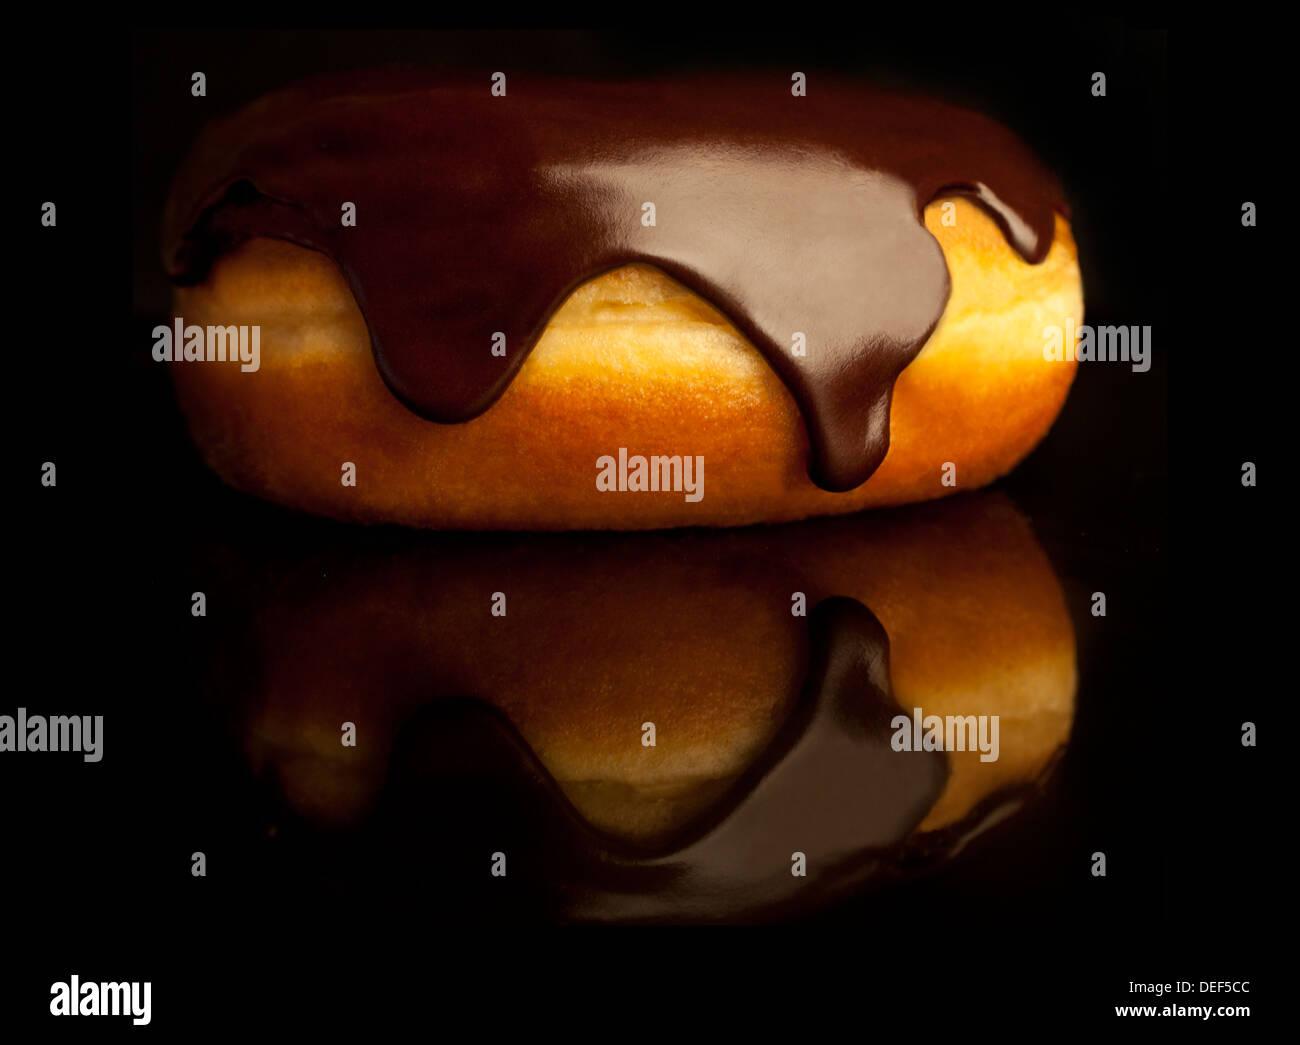 Savory donut - Stock Image